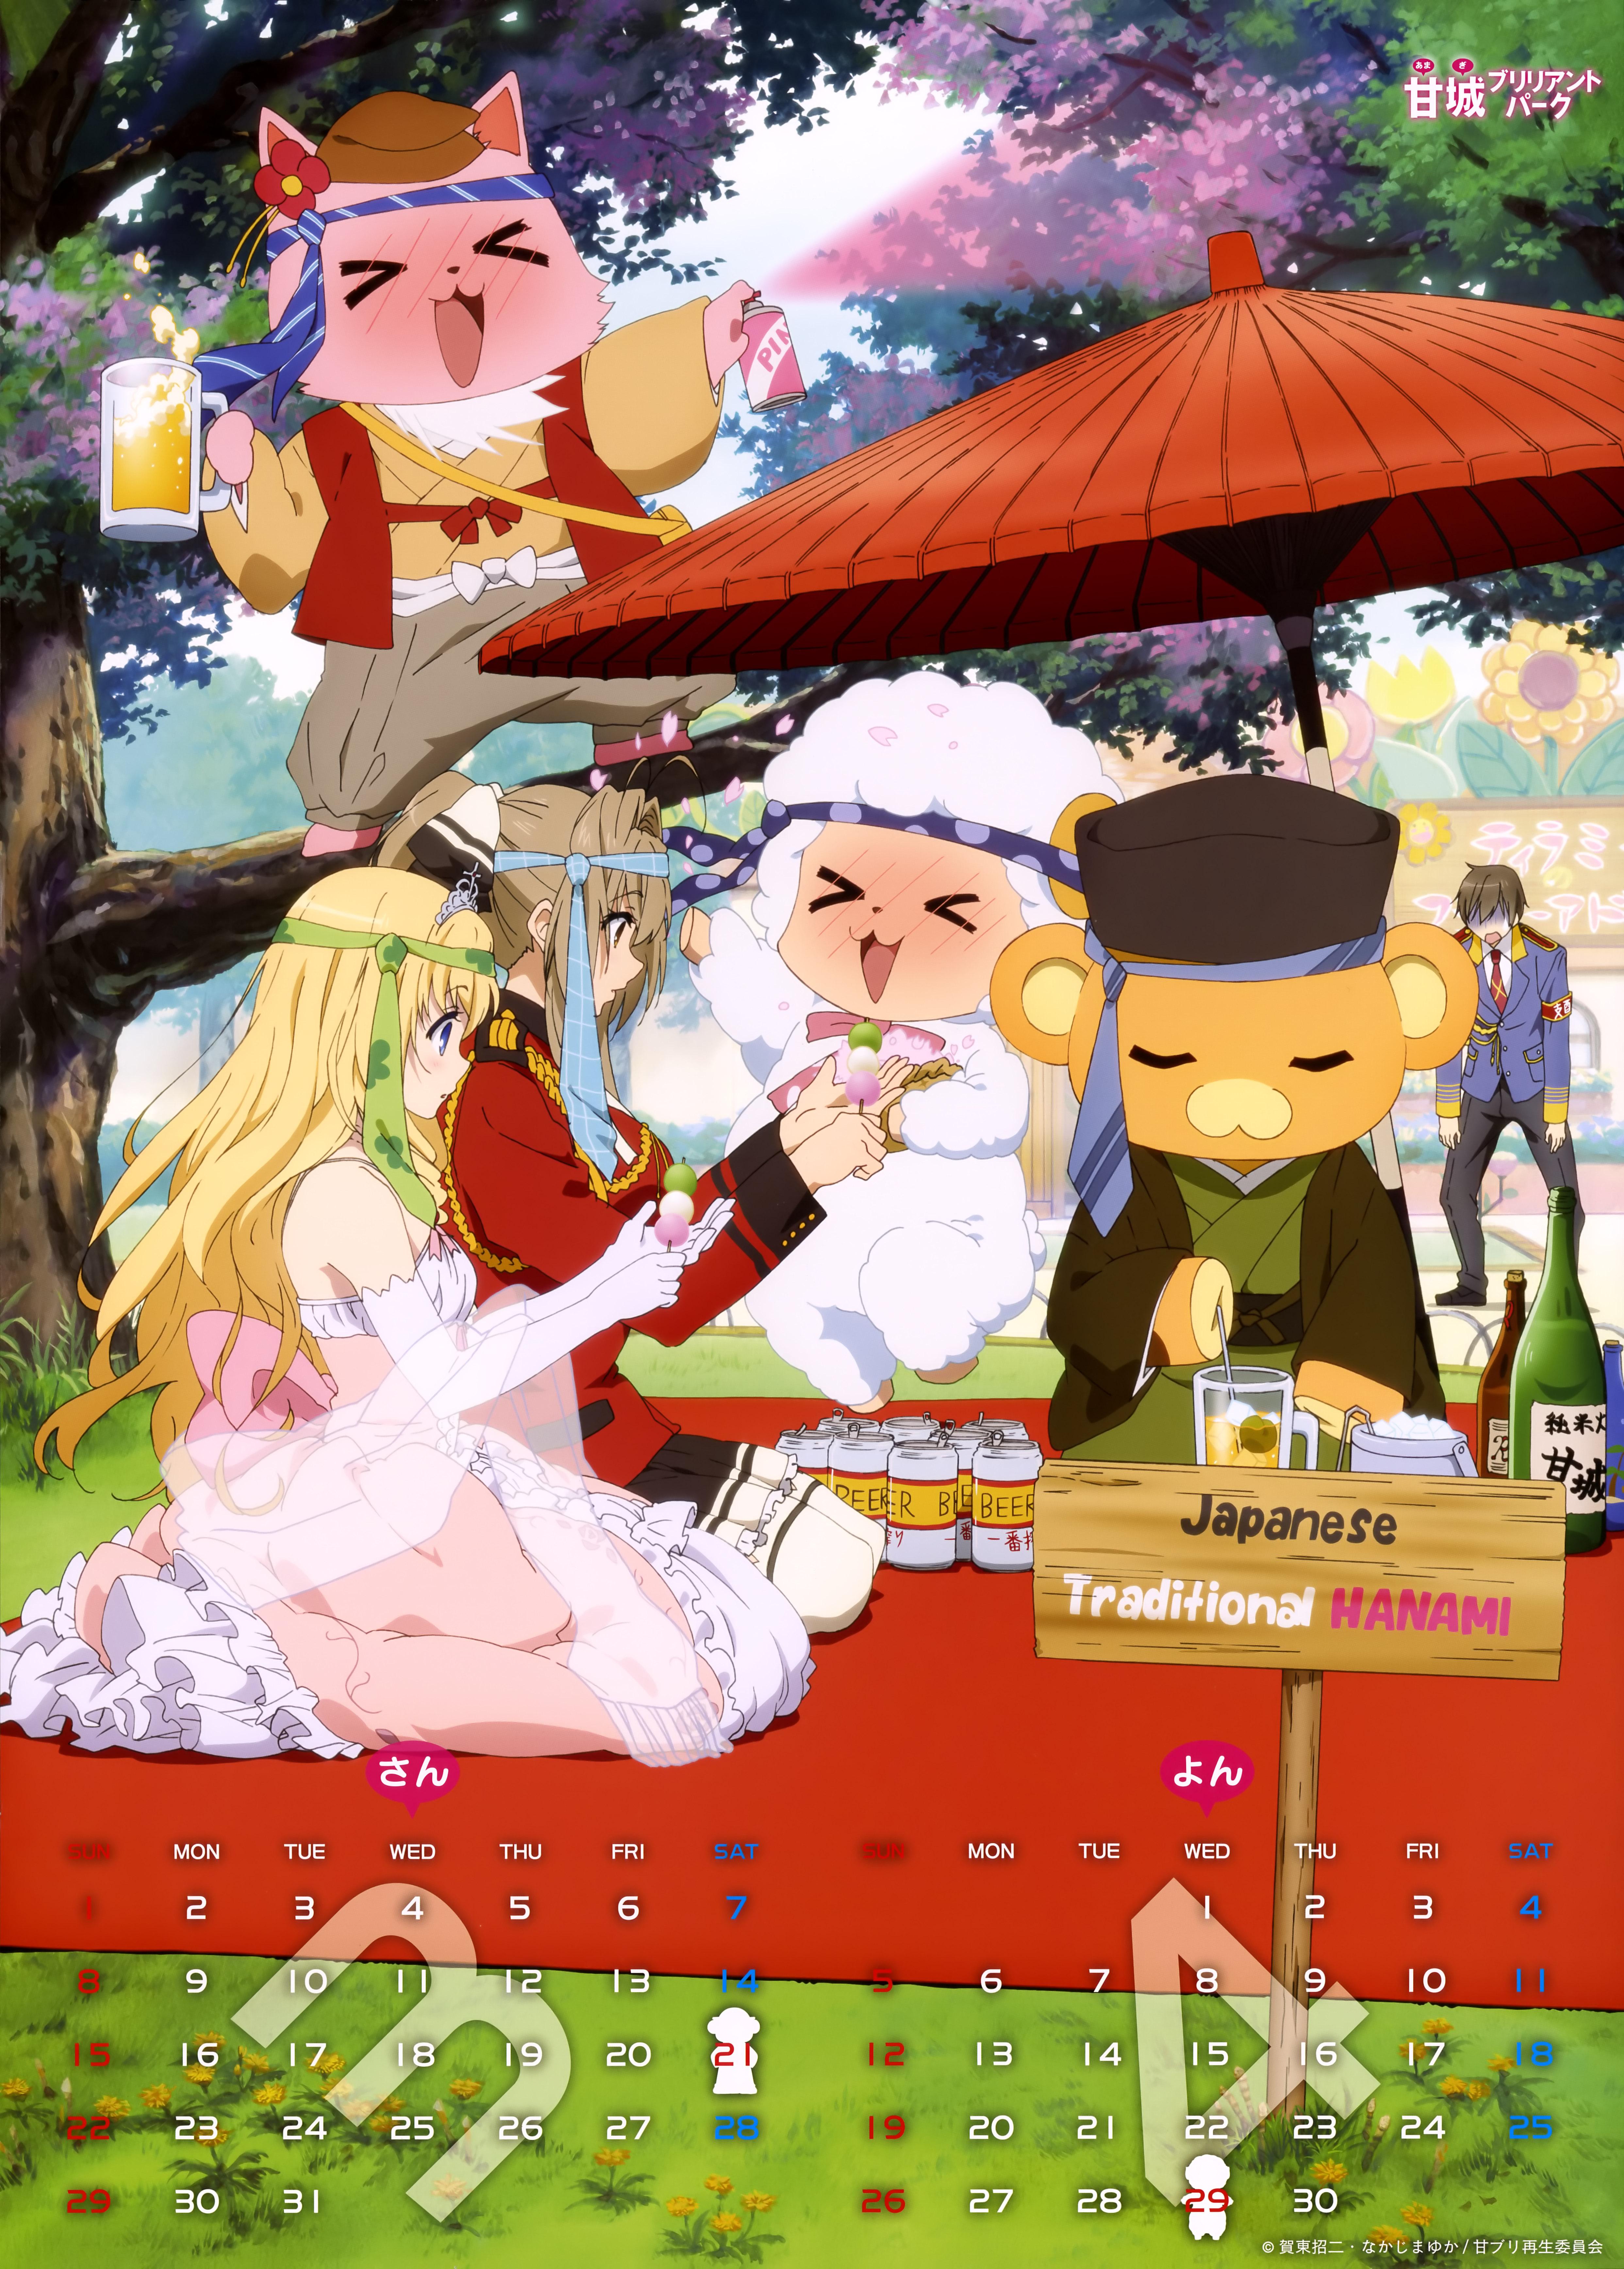 Amagi Brilliant Park 2015 Calendar Previewed Haruhichan.com amaburi anime calendar 02